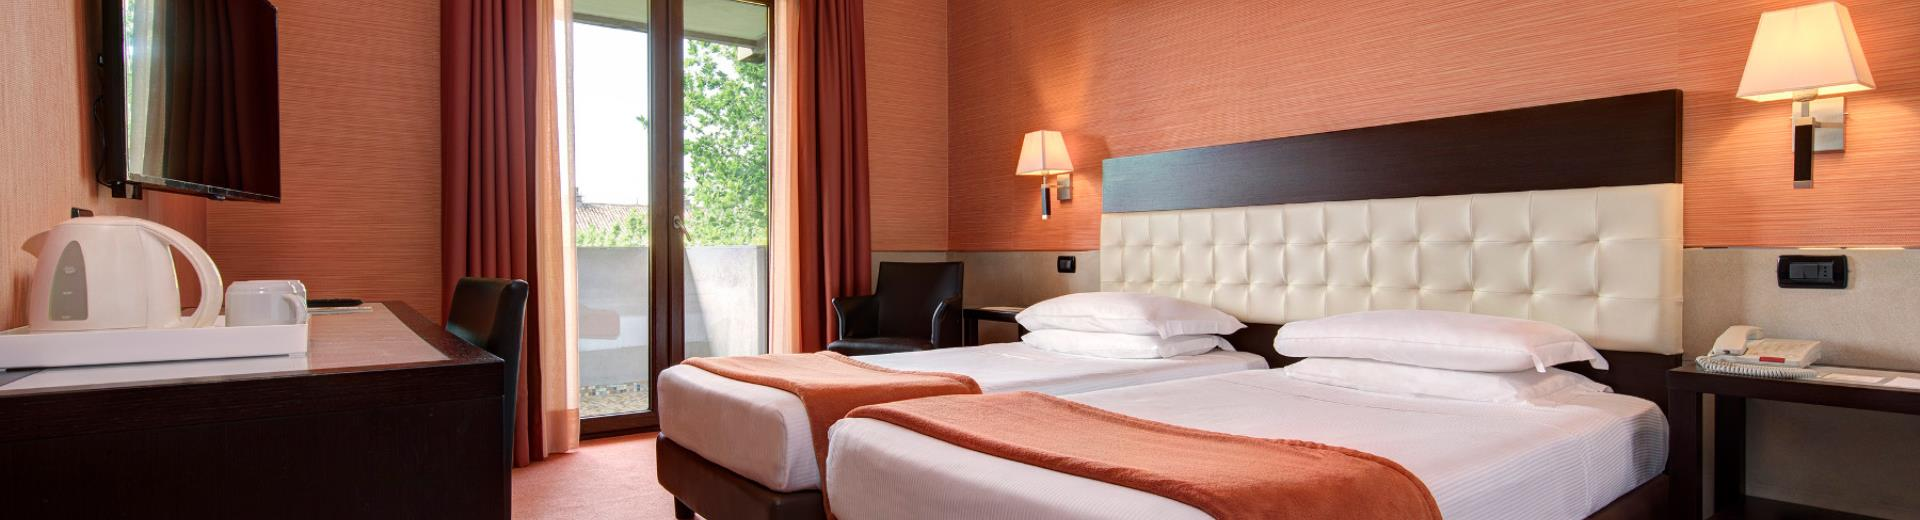 Camere Hotel 4 stelle Gorizia-Best Western Gorizia Palace Hotel